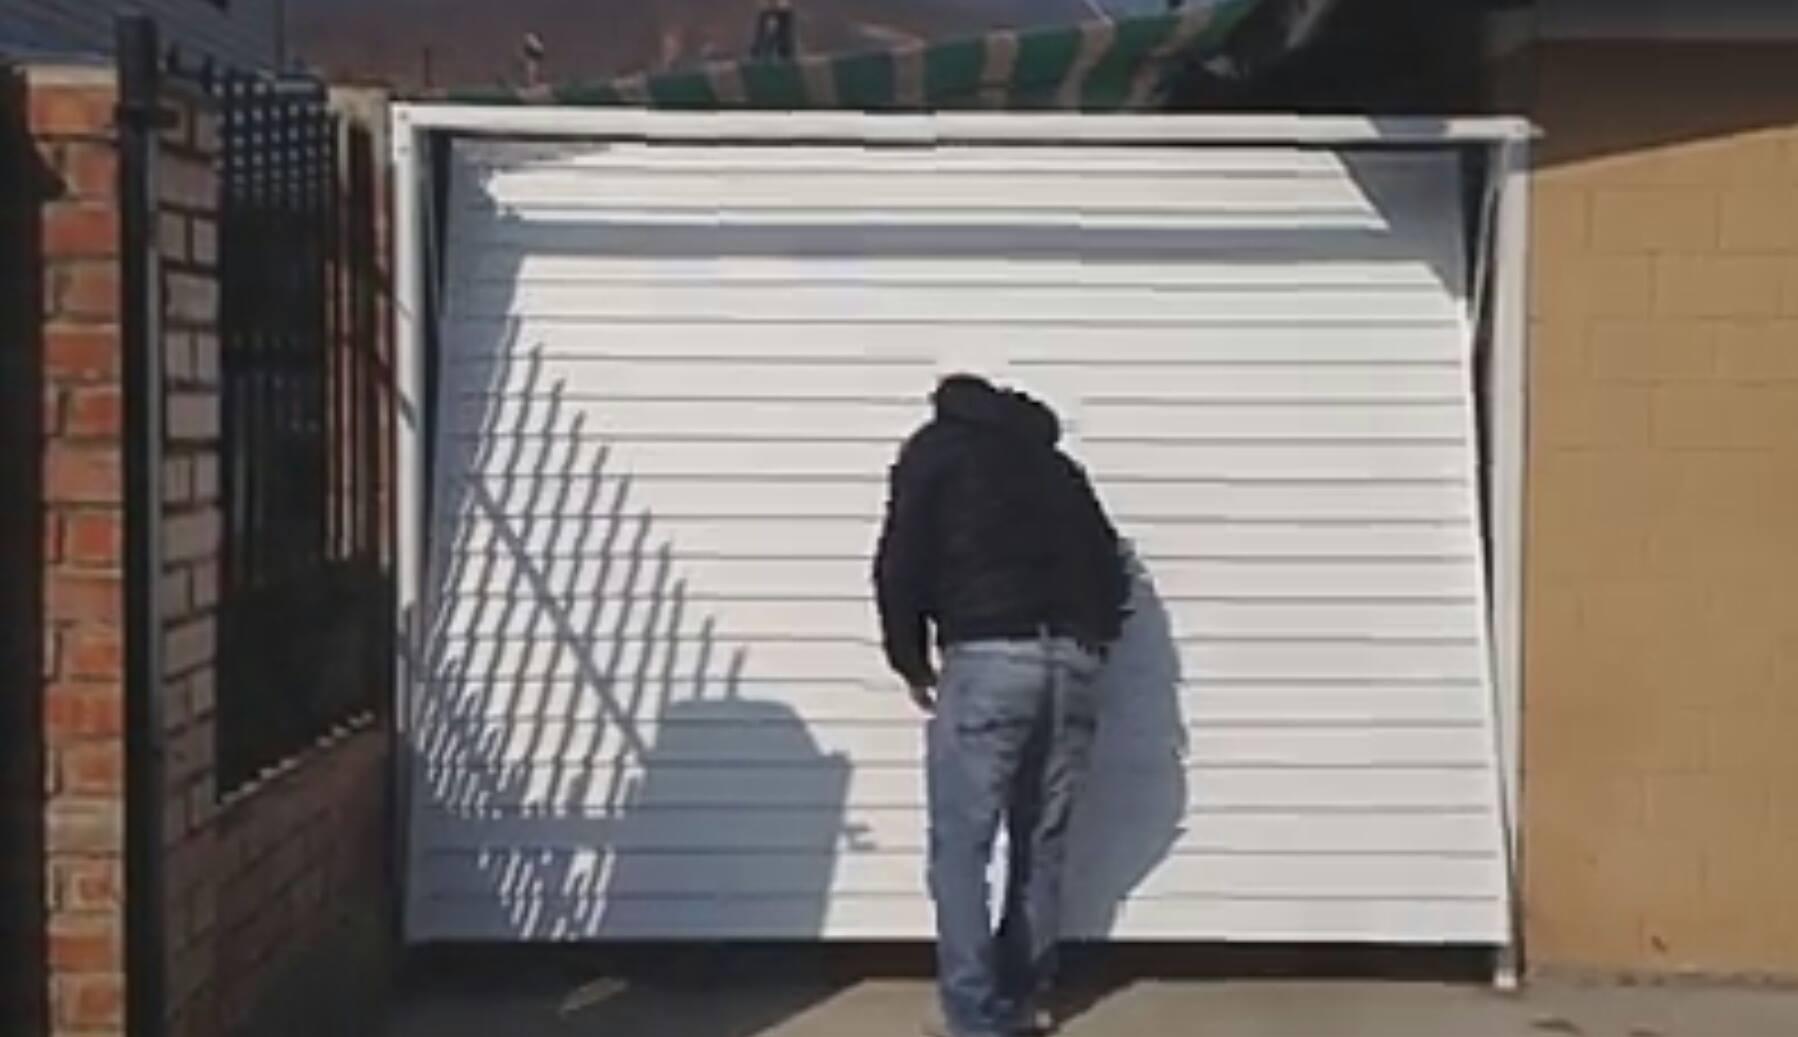 Forma de abrir este portón